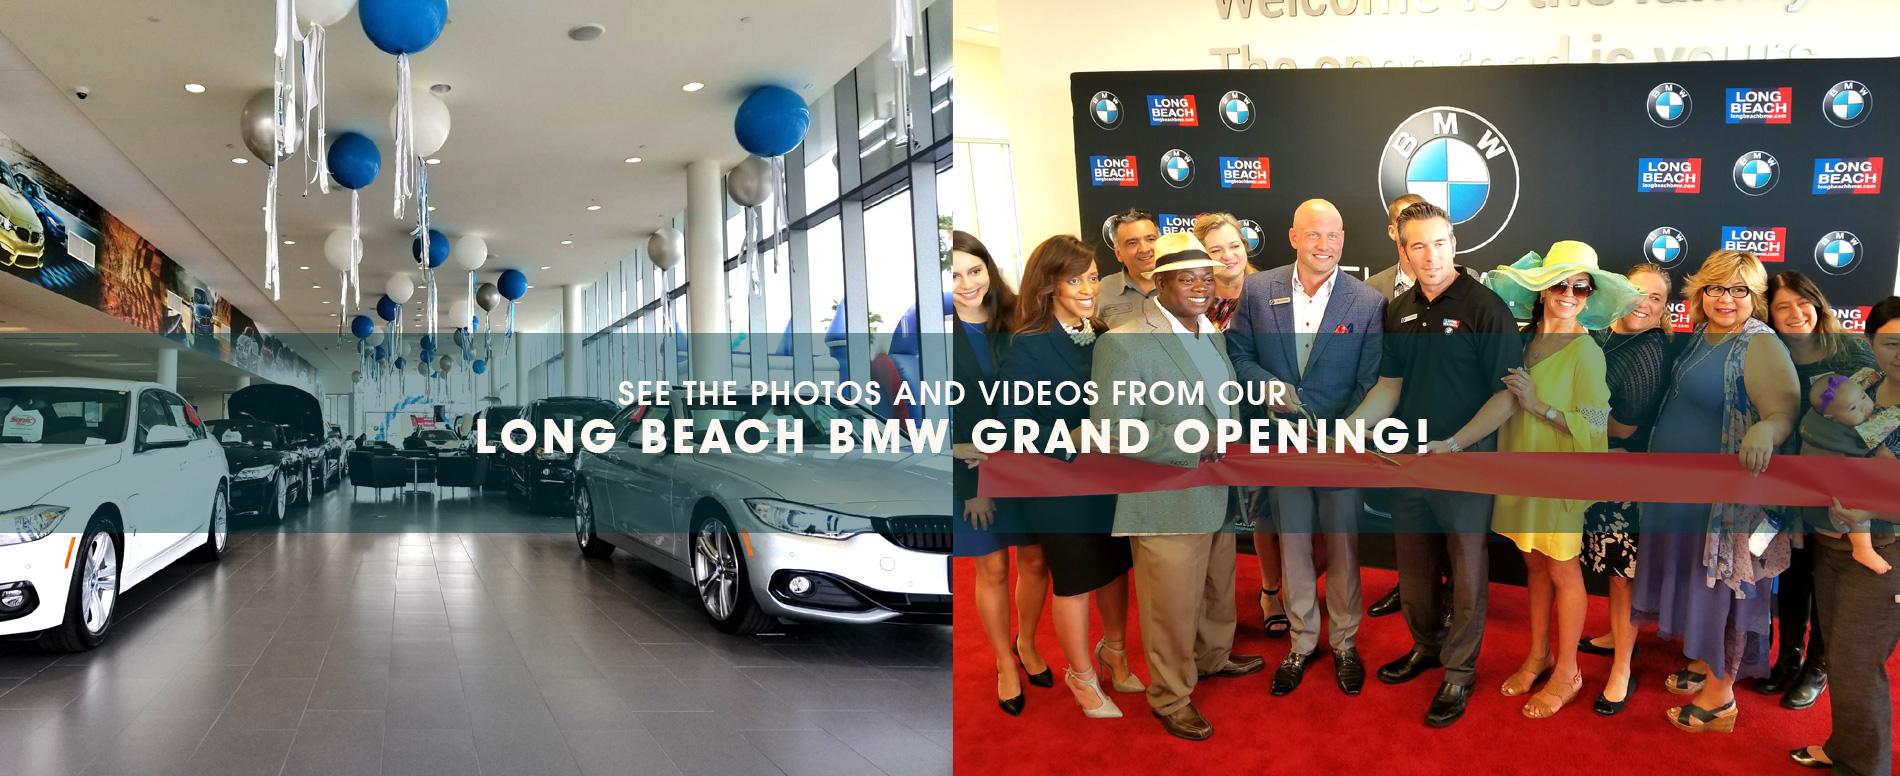 Long Beach BMW